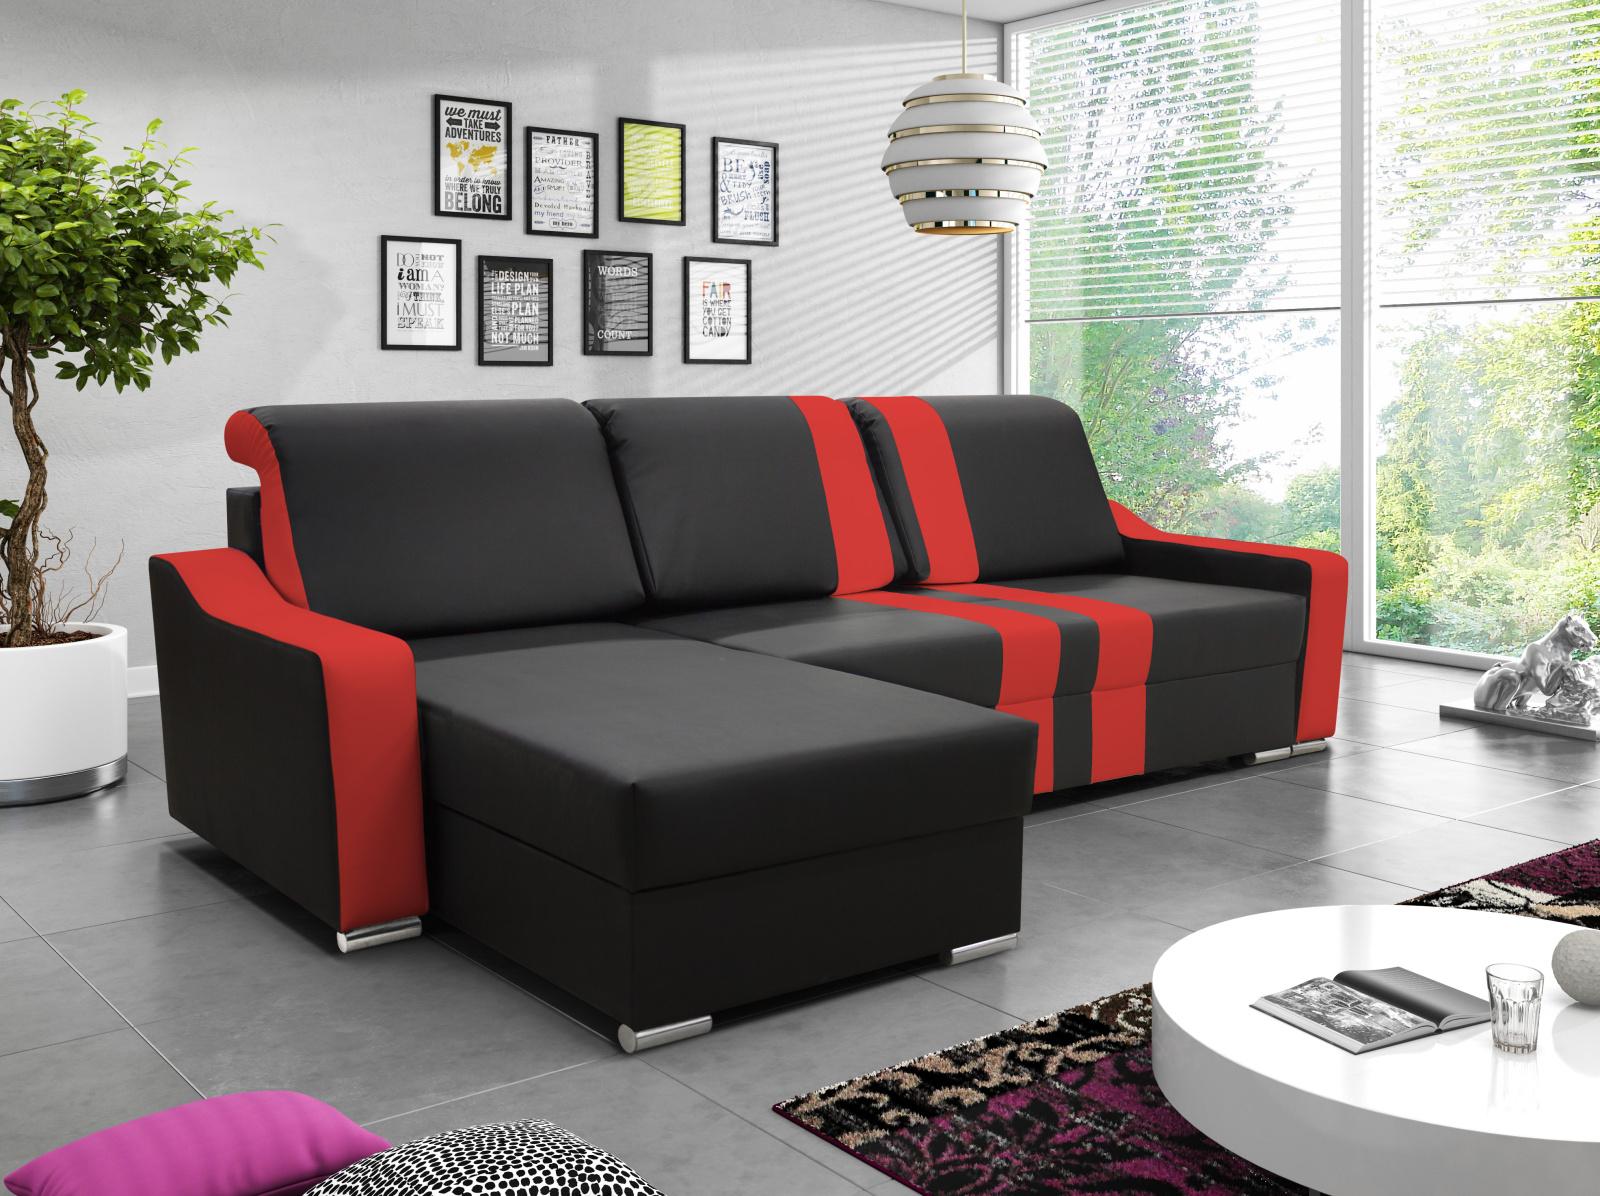 Smartshop Rohová sedačka COMO 2, černá ekokůže/červená ekokůže